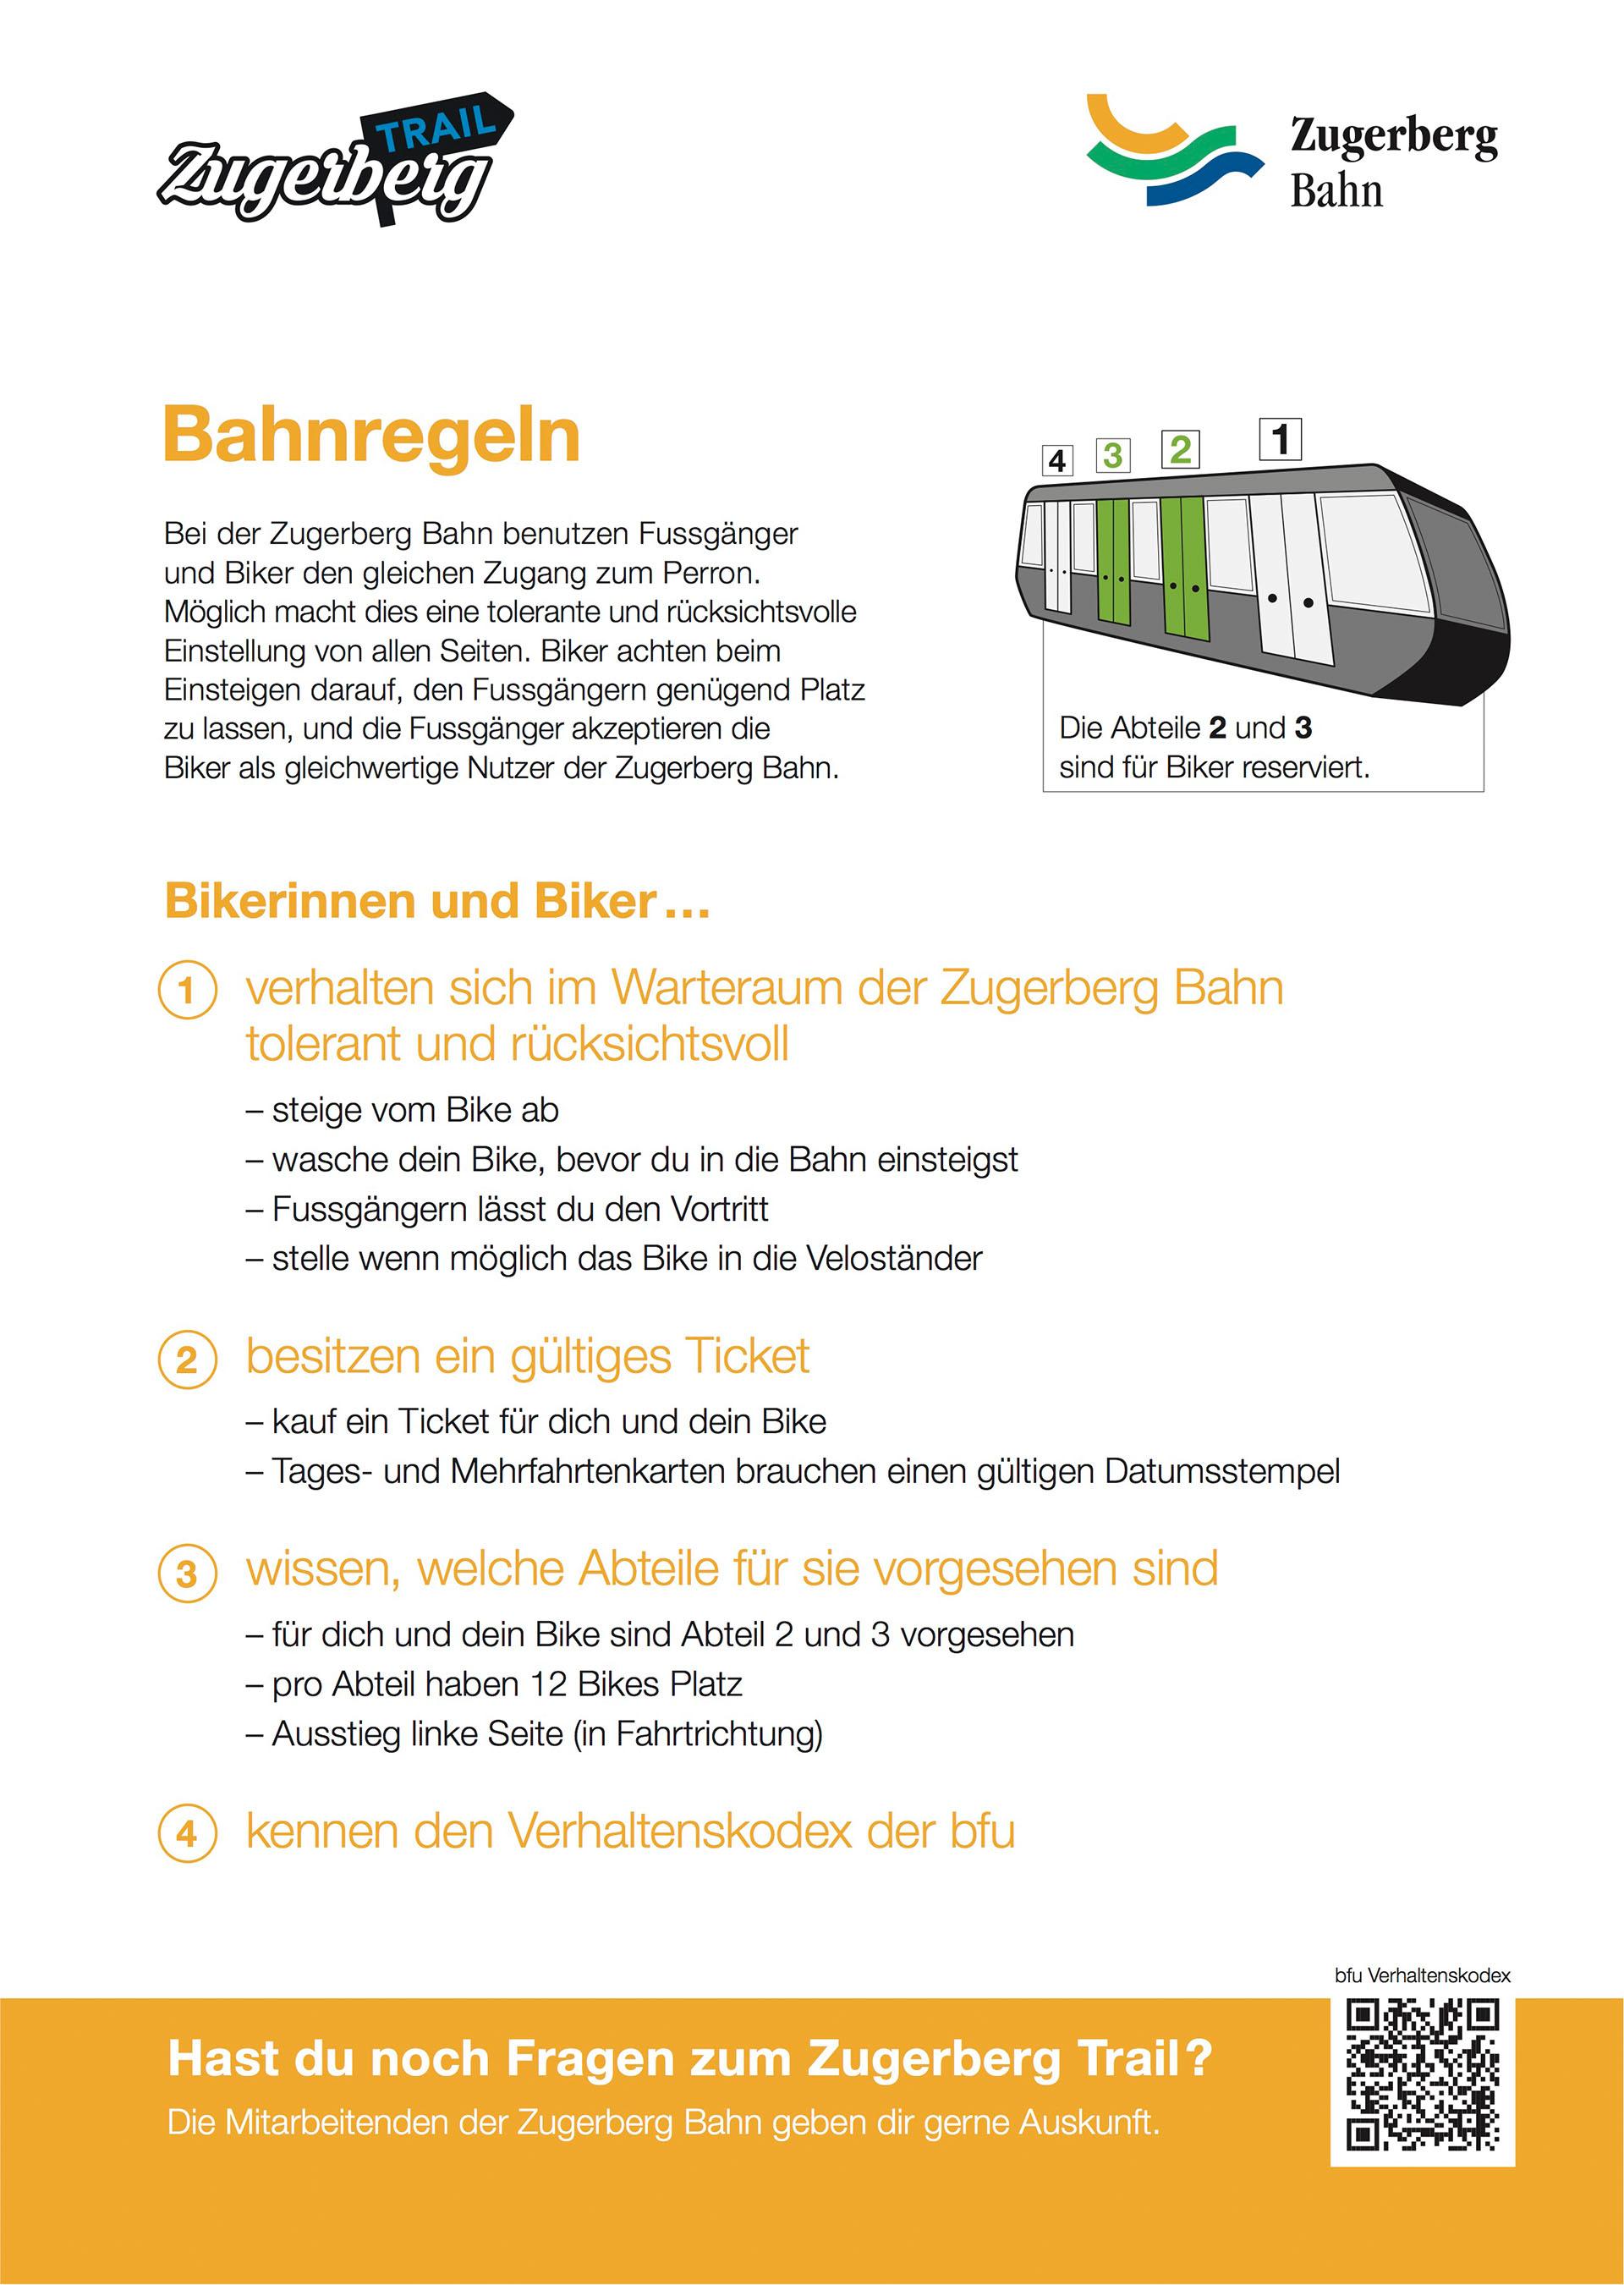 ZBB_Zugerberg_Trail_Benutzerordnung_A2_high_web